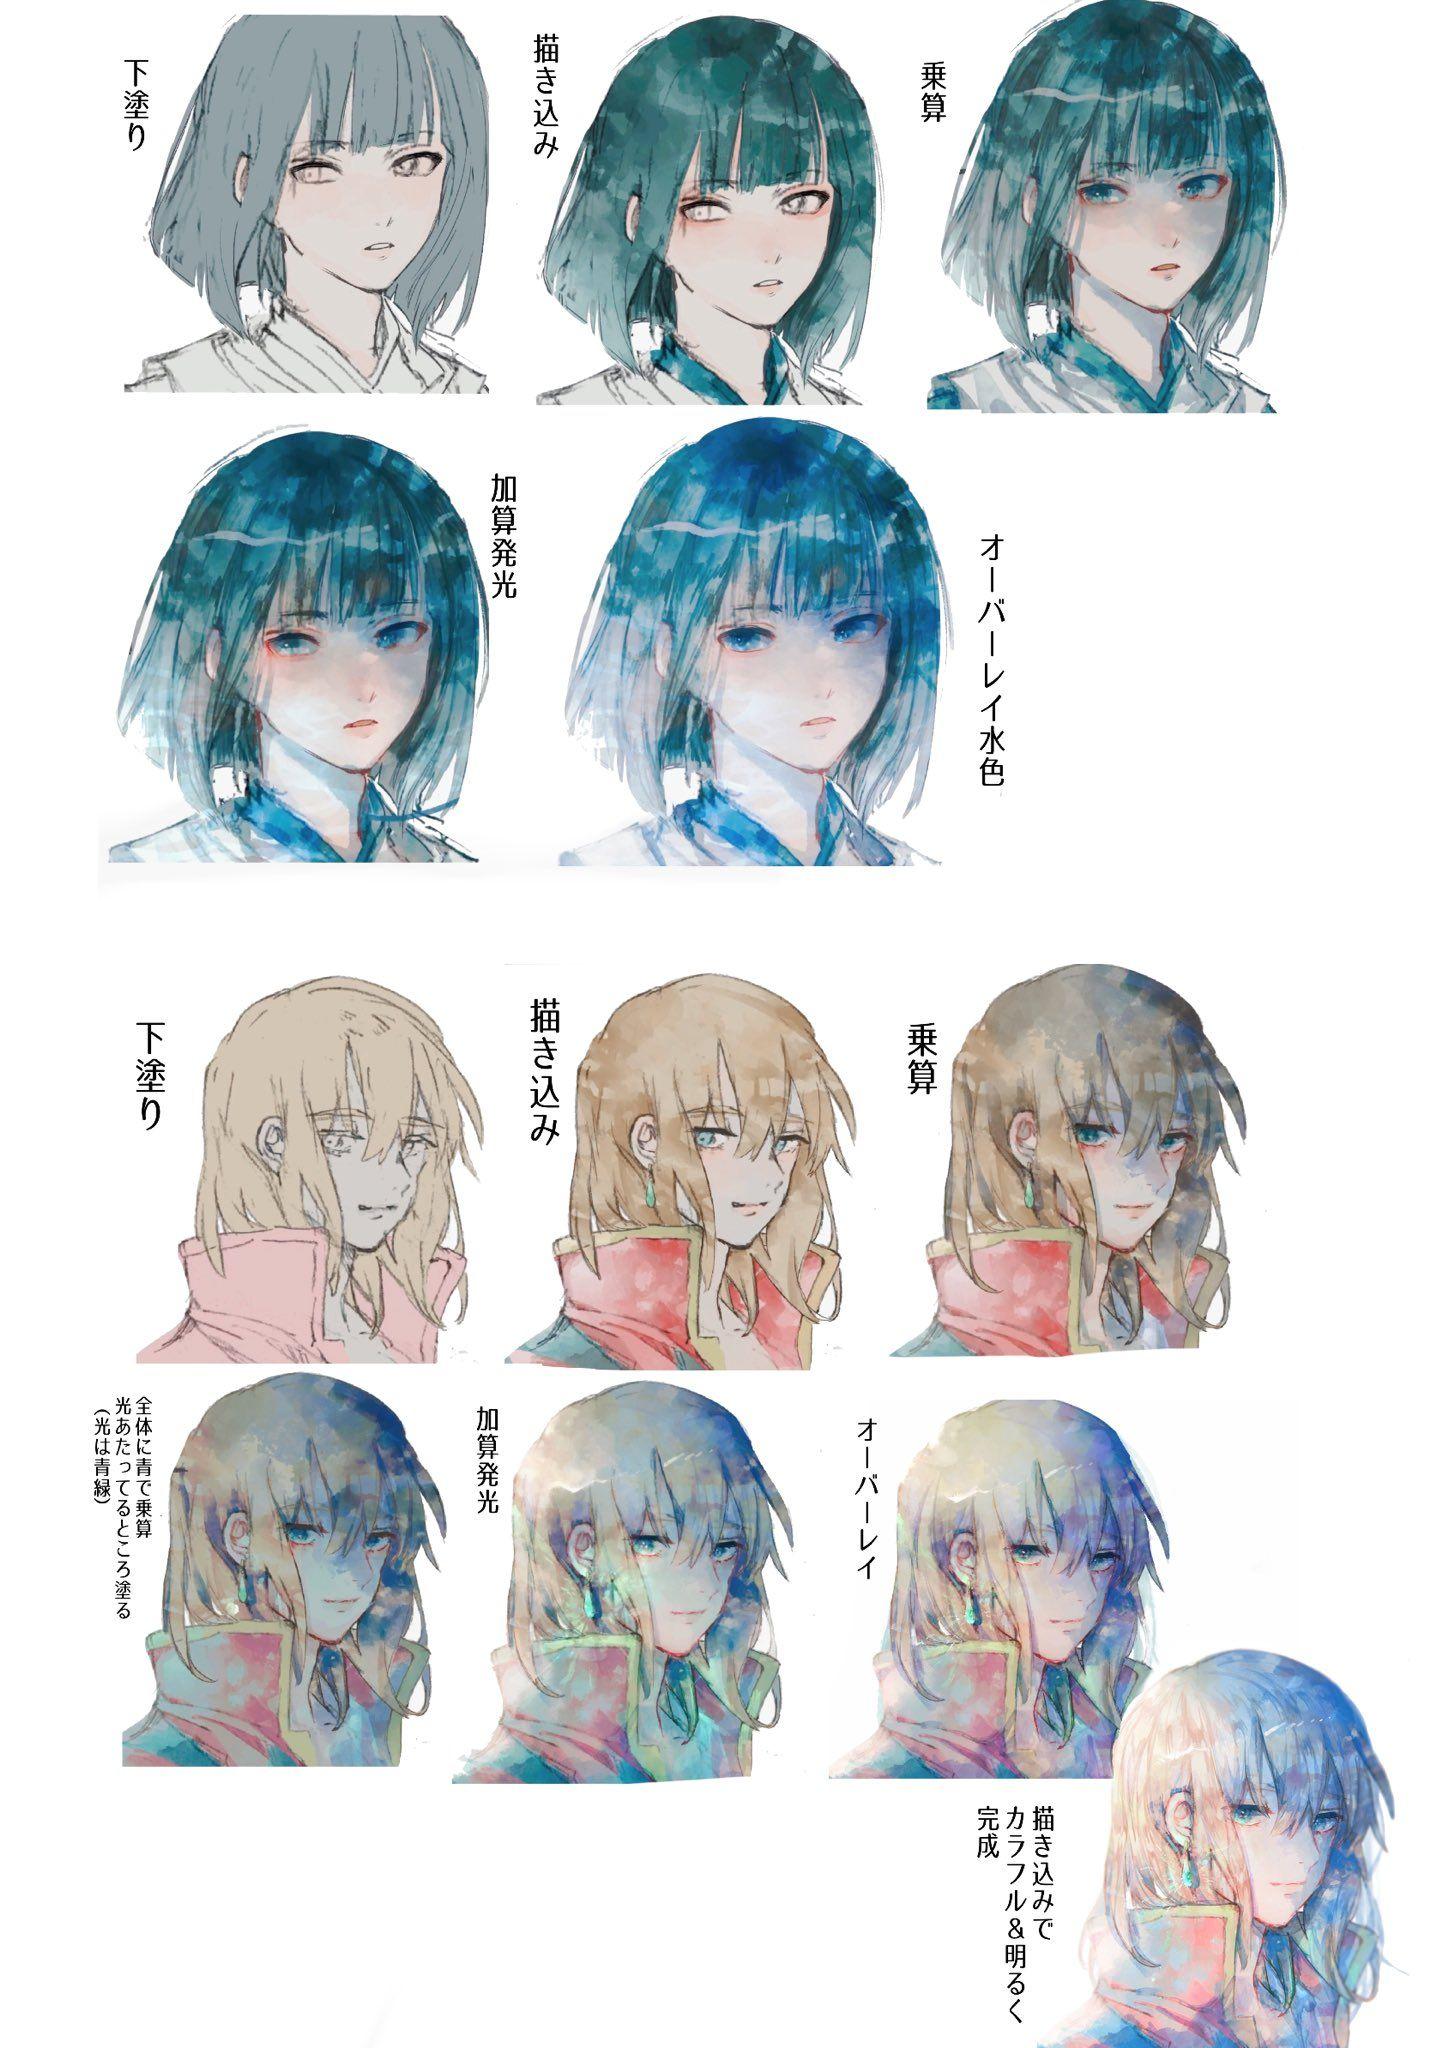 Oo6 On Twitter Anime Drawings Tutorials Digital Art Tutorial Art Reference Poses